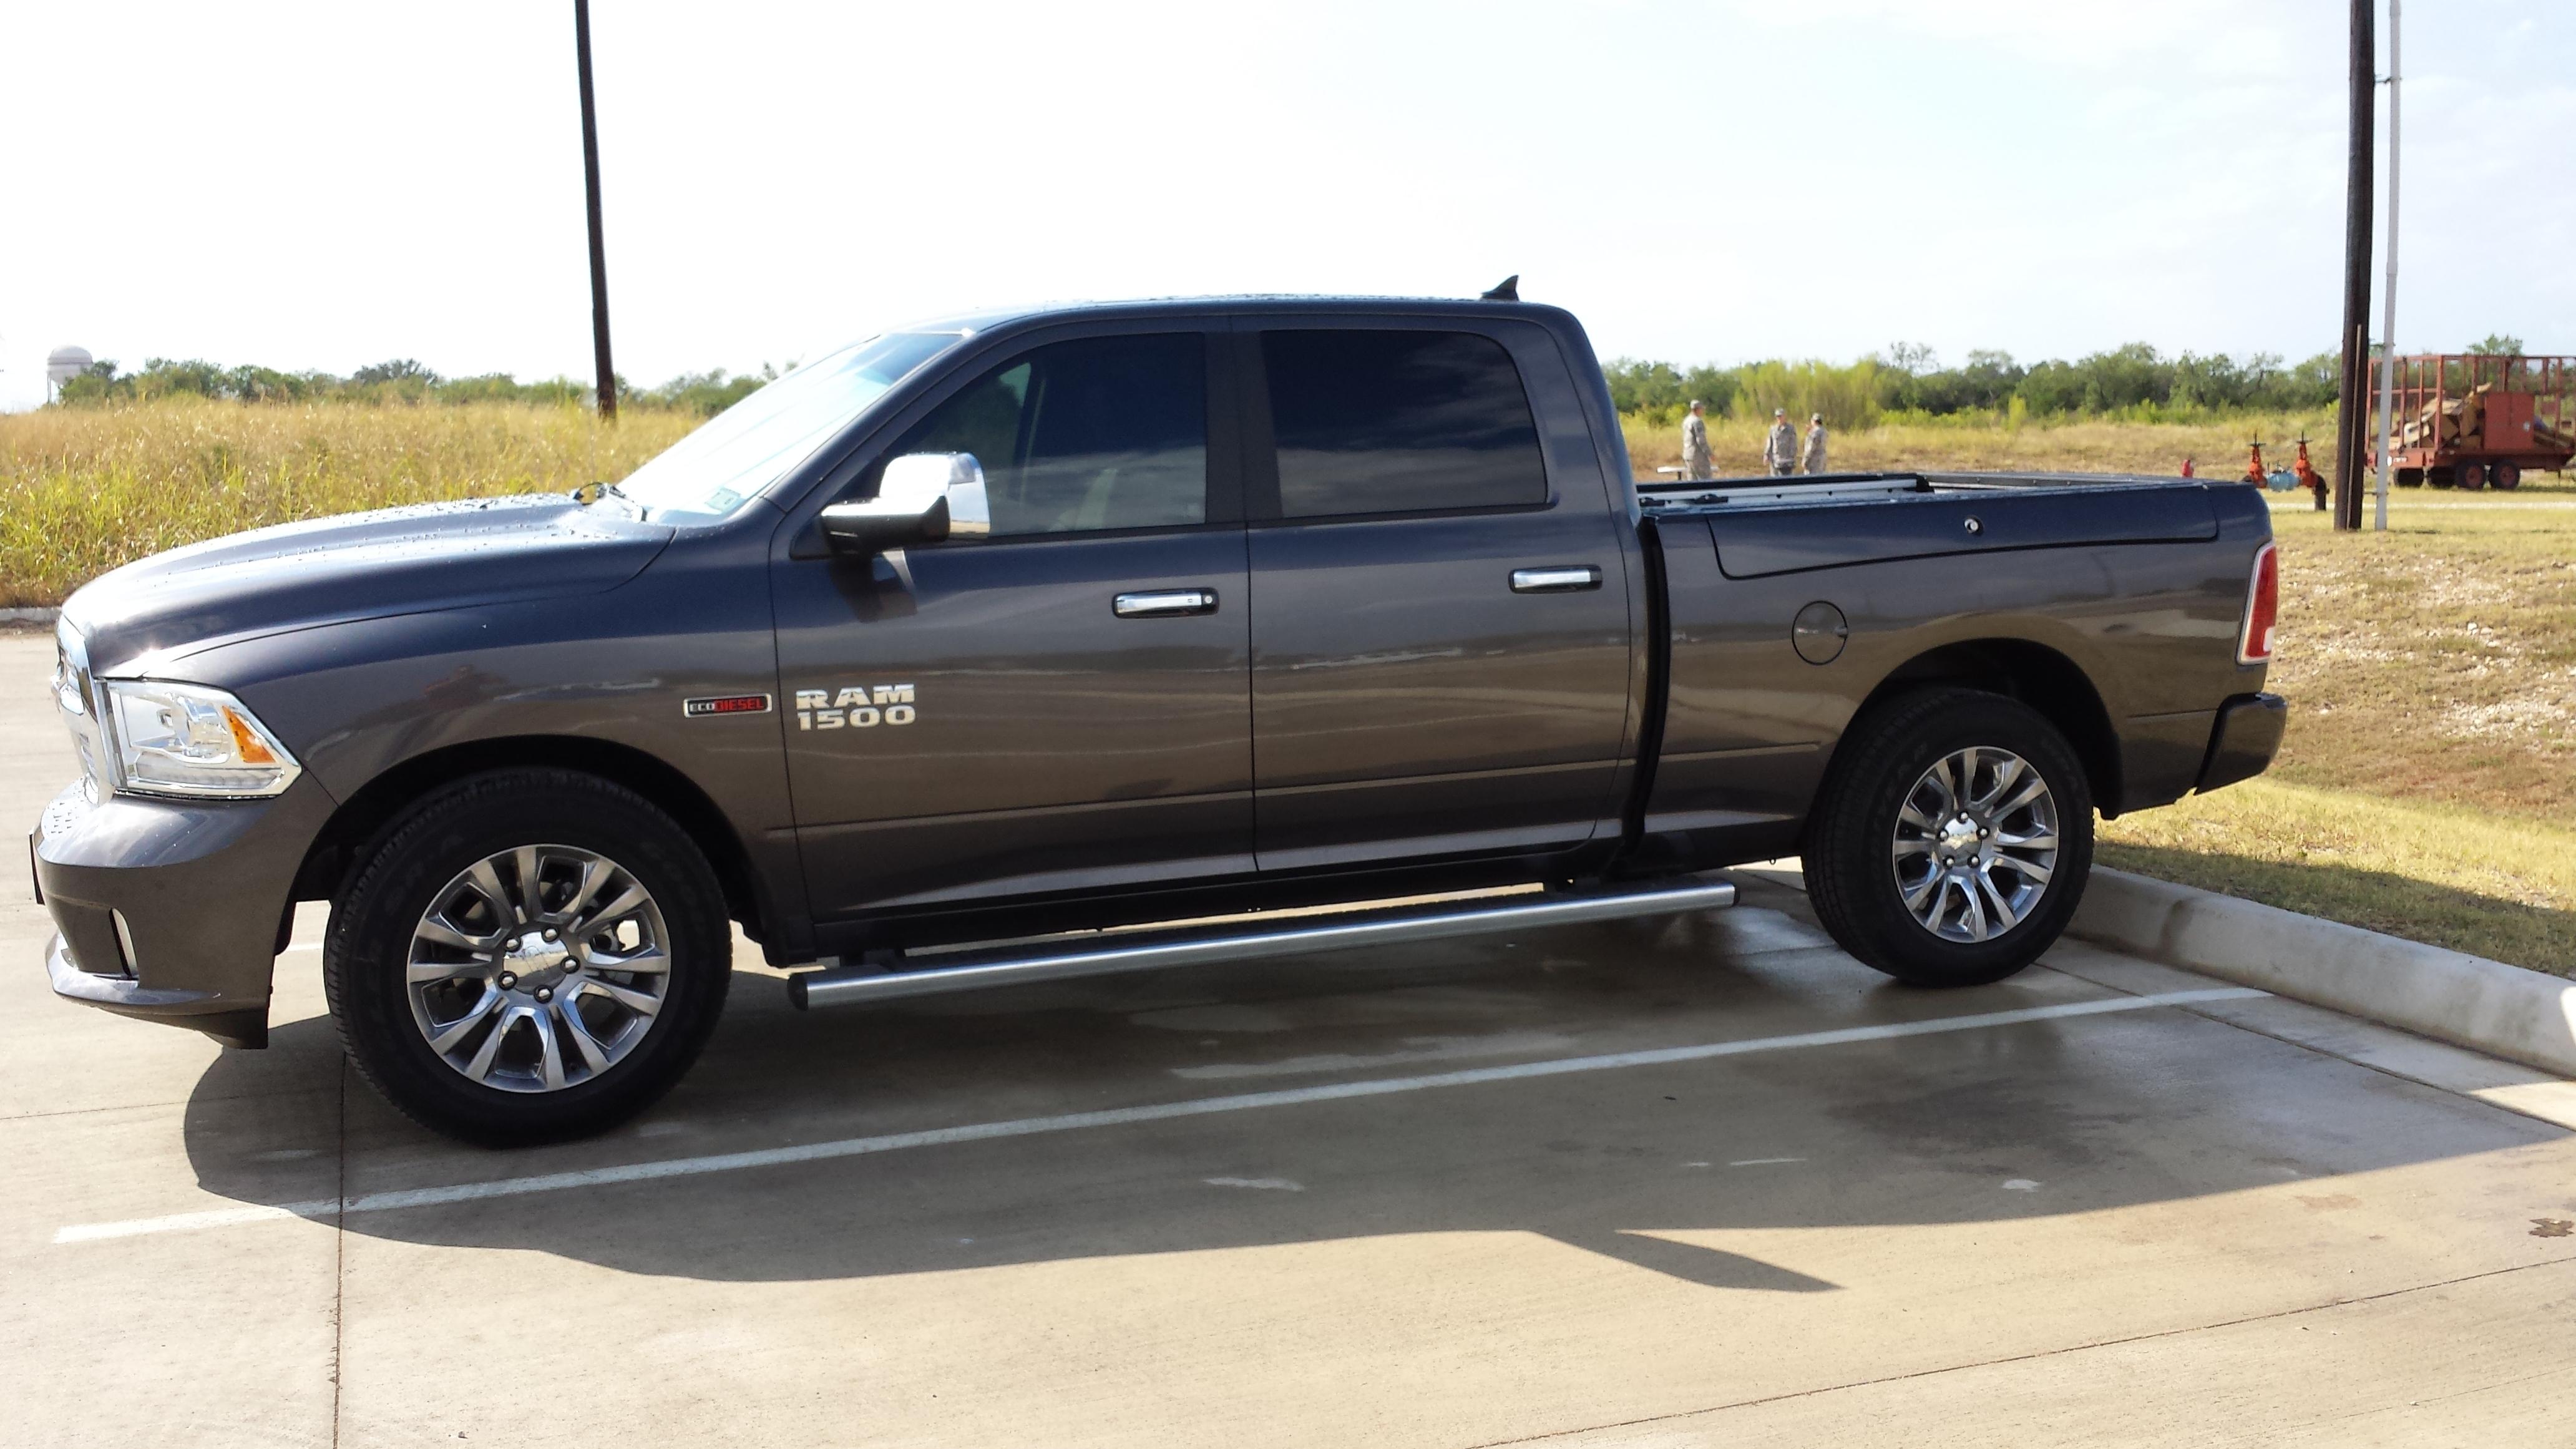 Used Dodge Ram Ecodiesel For Sale >> 2014 Dodge Ram 1500 Diesel At Dealer | Autos Post